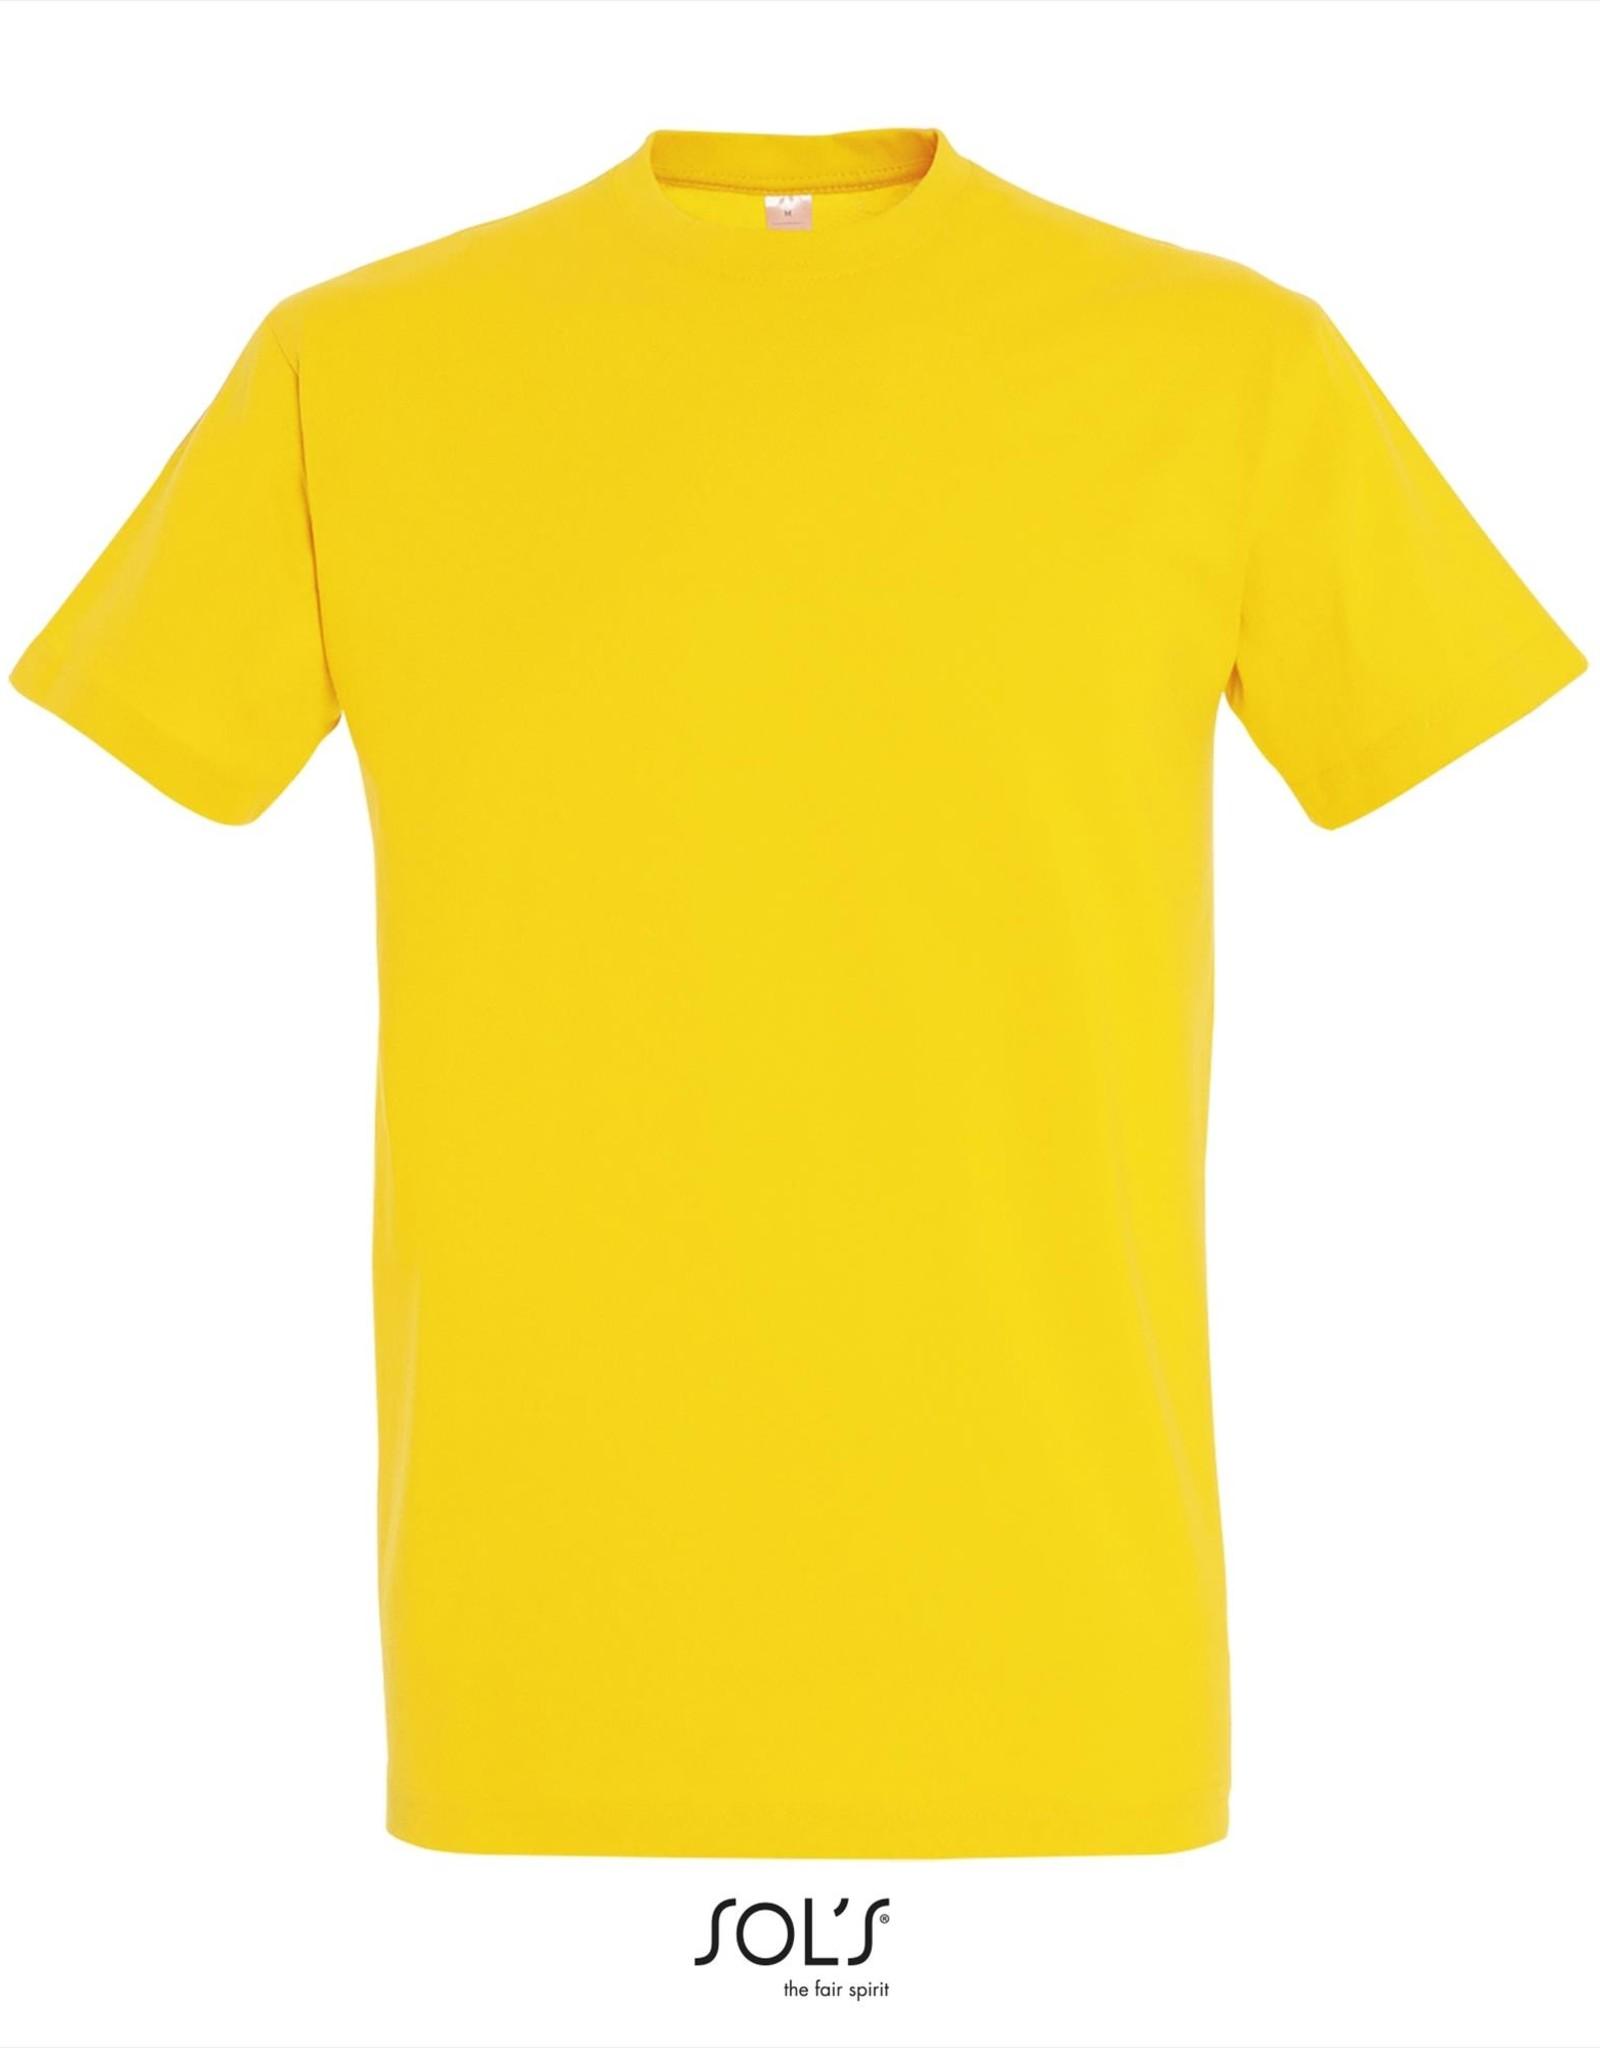 Sol's T-SHIRT basic ronde hals gekleurd 'Imperial' geel